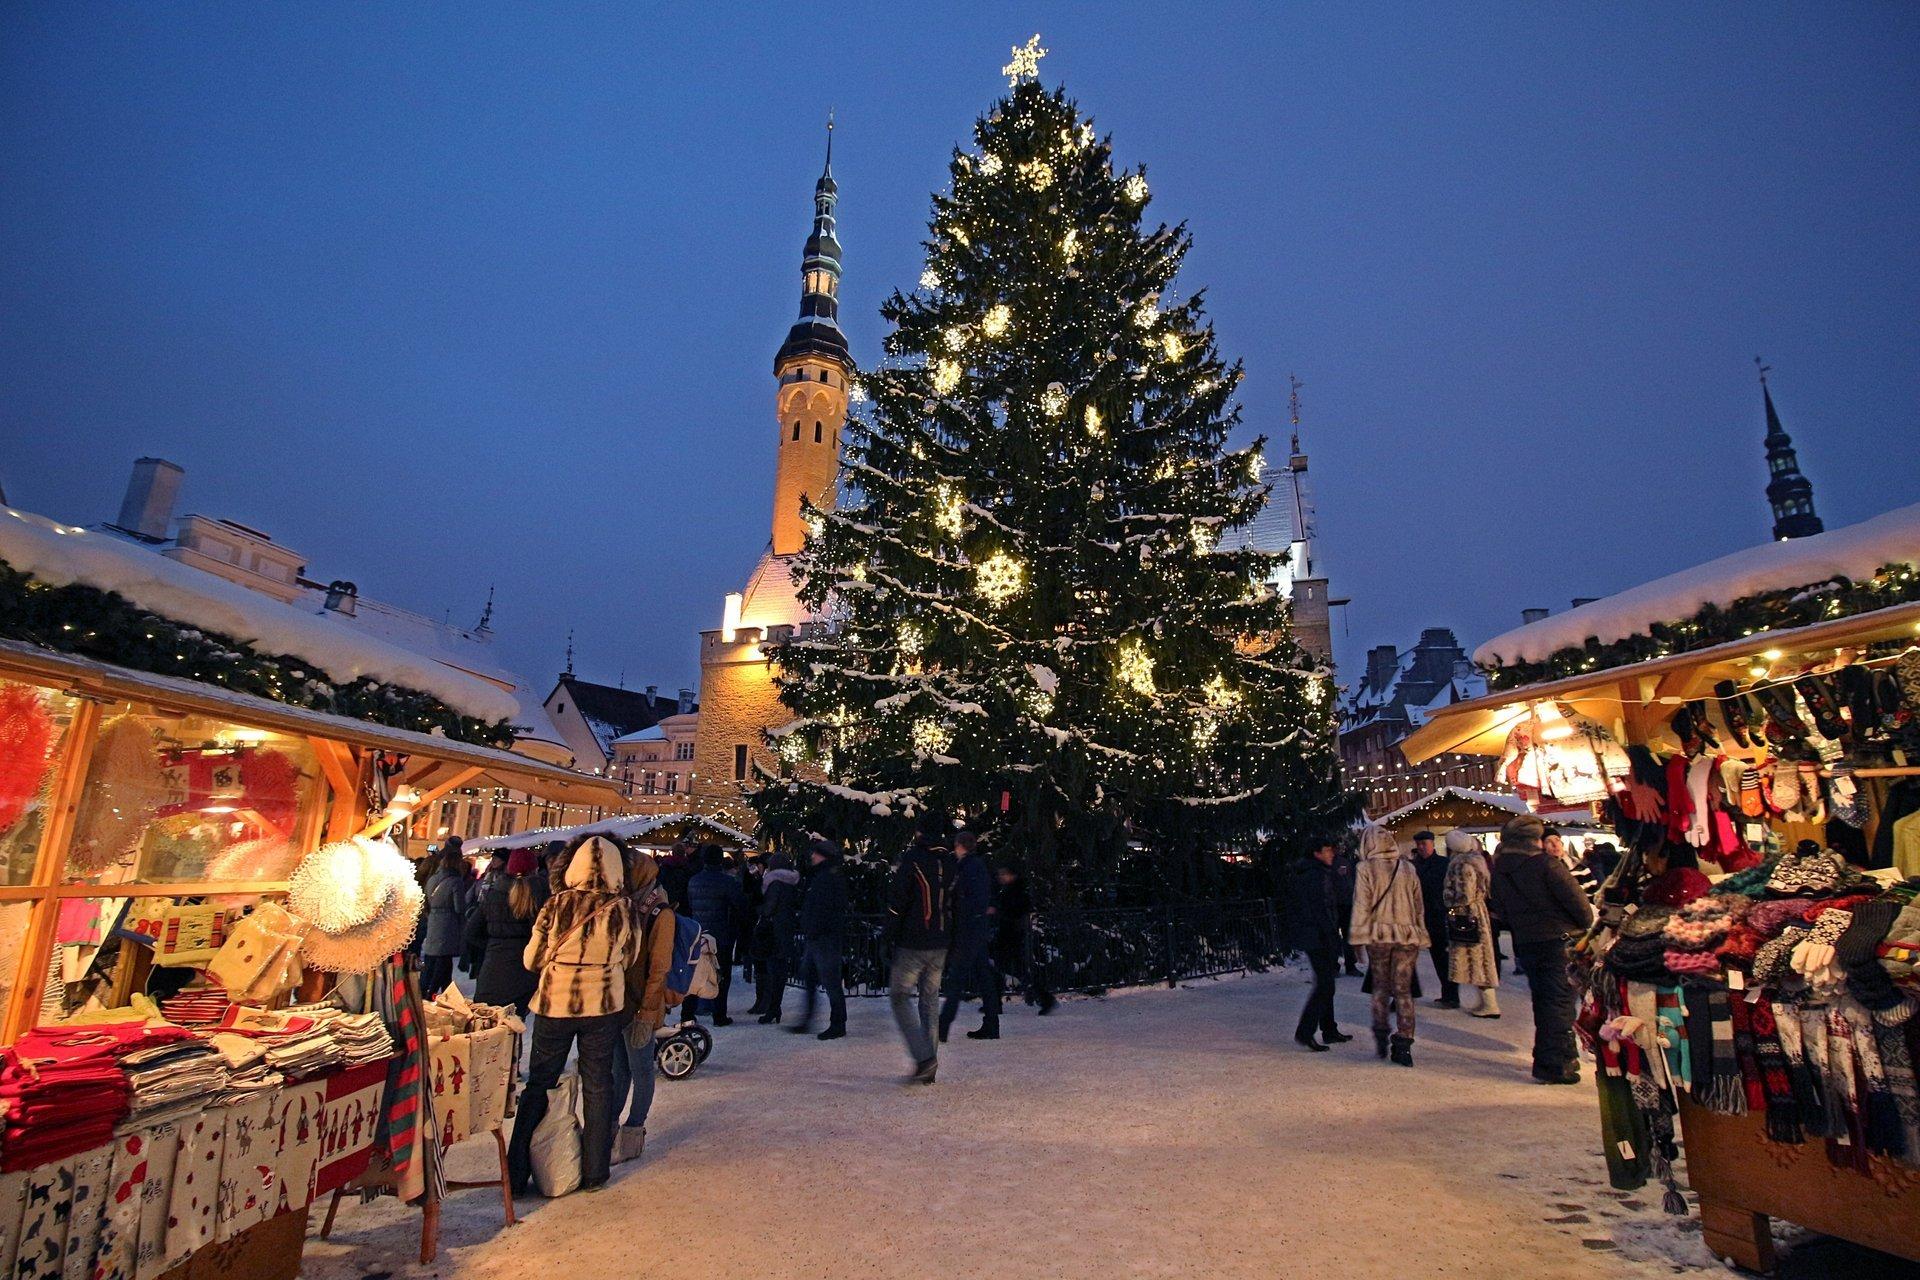 Christmas Market in Tallinn in Estonia - Best Season 2019